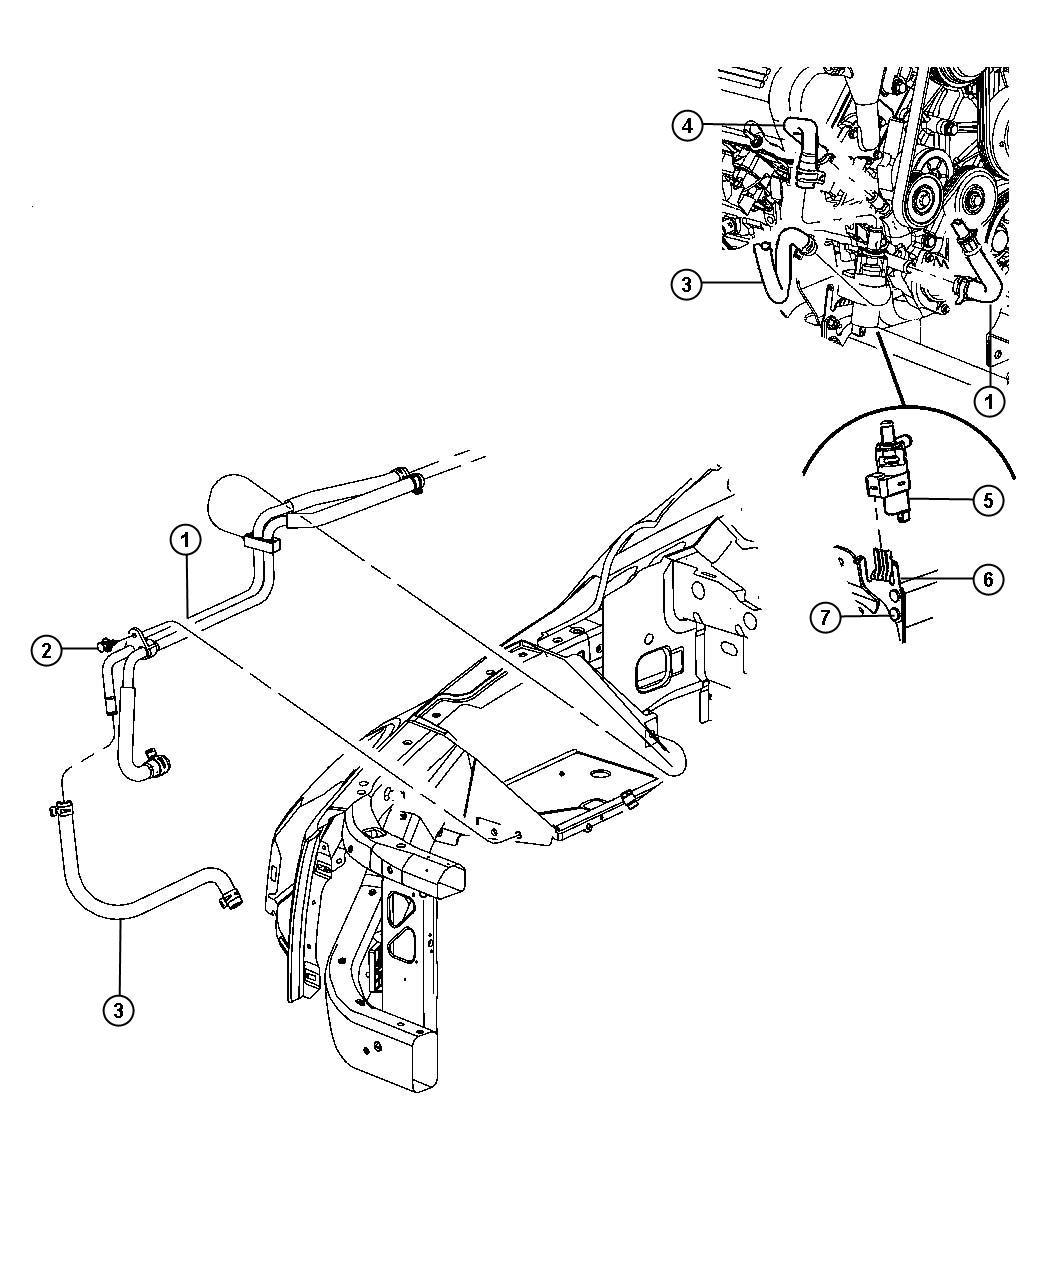 Chrysler Aspen Hose Heater Supply And Return With